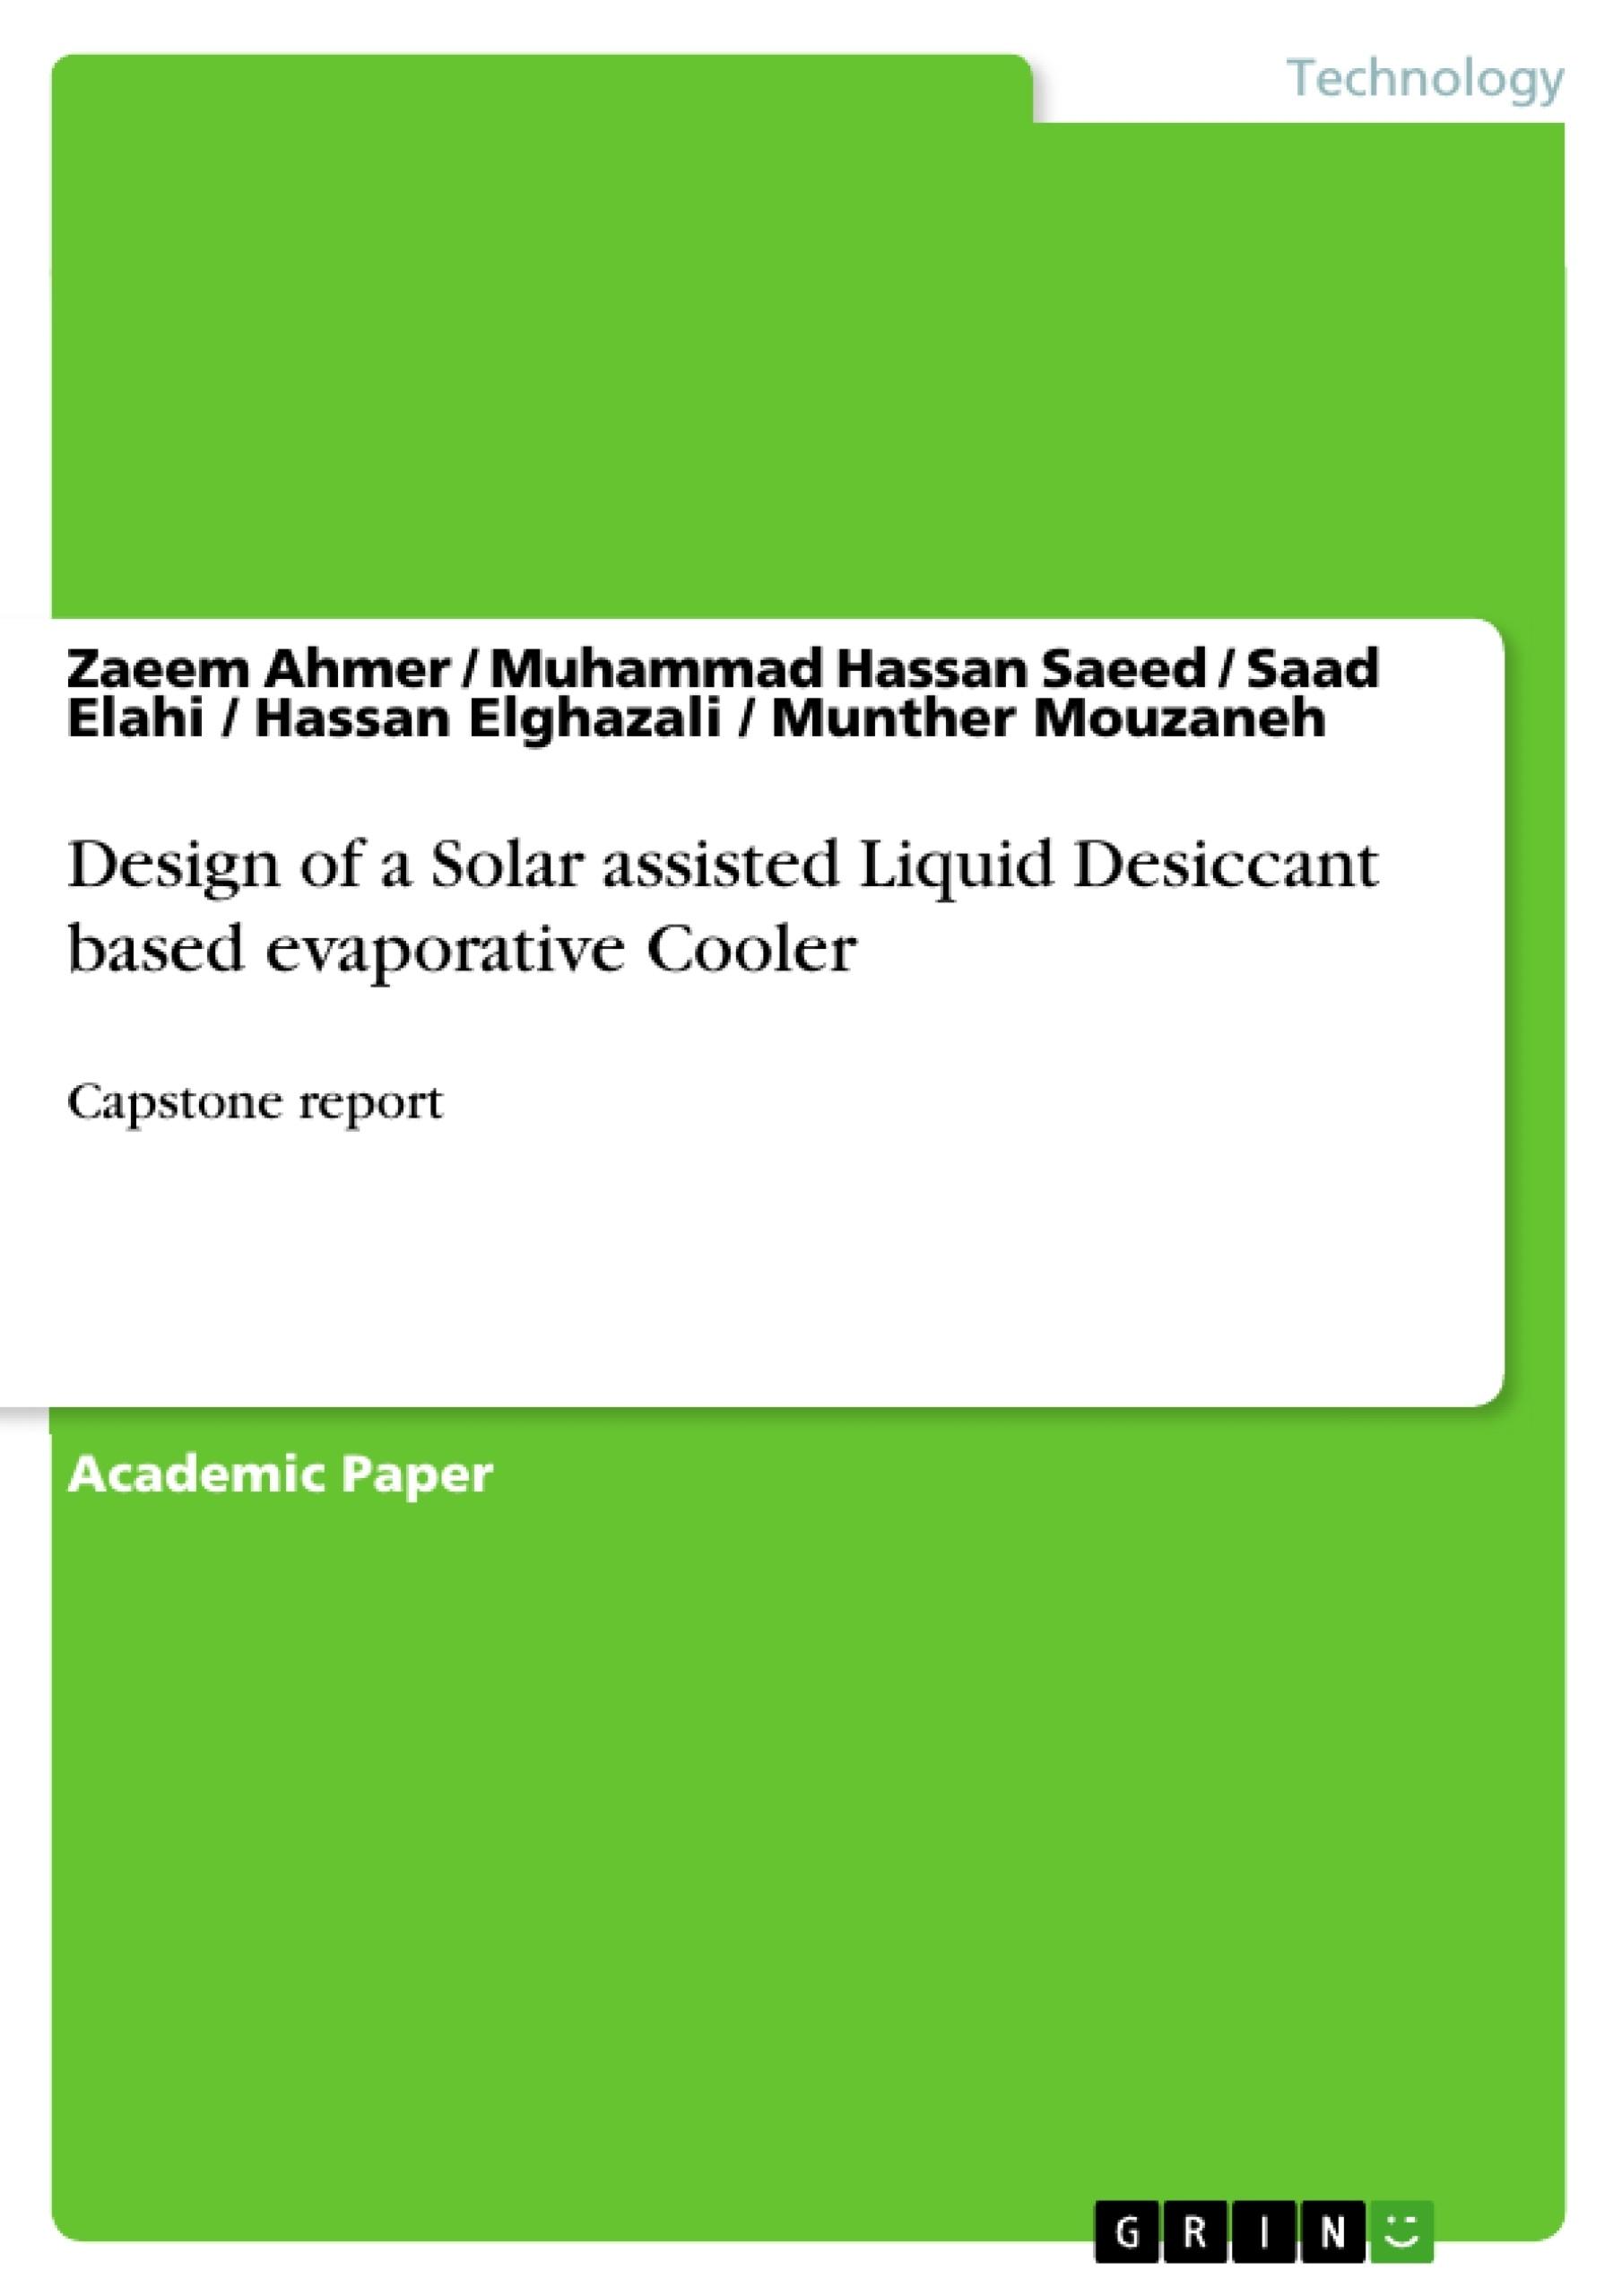 Title: Design of a Solar assisted Liquid Desiccant based evaporative Cooler